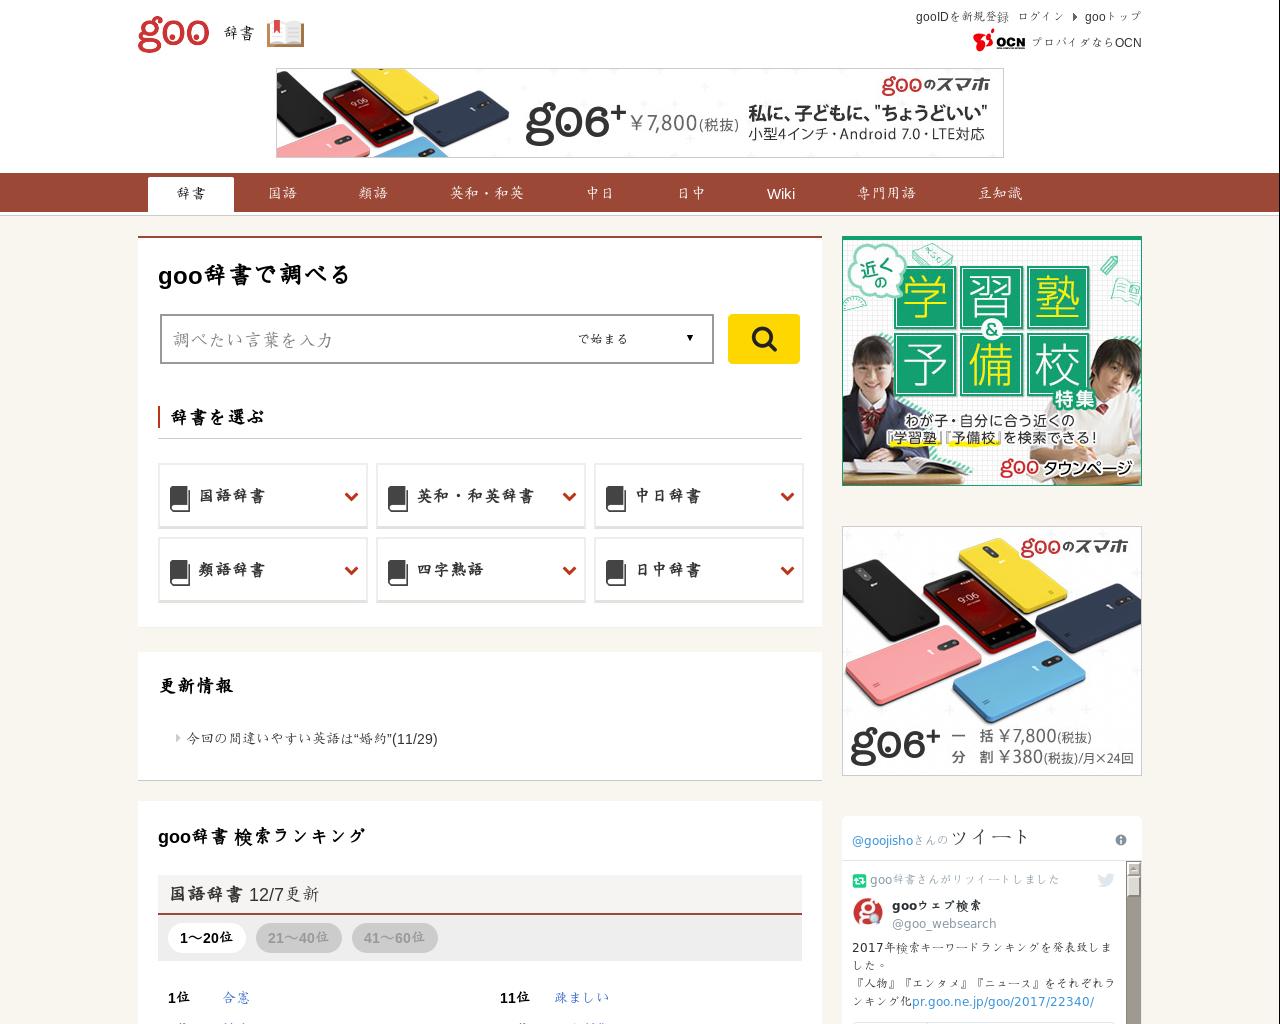 dictionary.goo.ne.jp(2017/12/02 05:31:20)